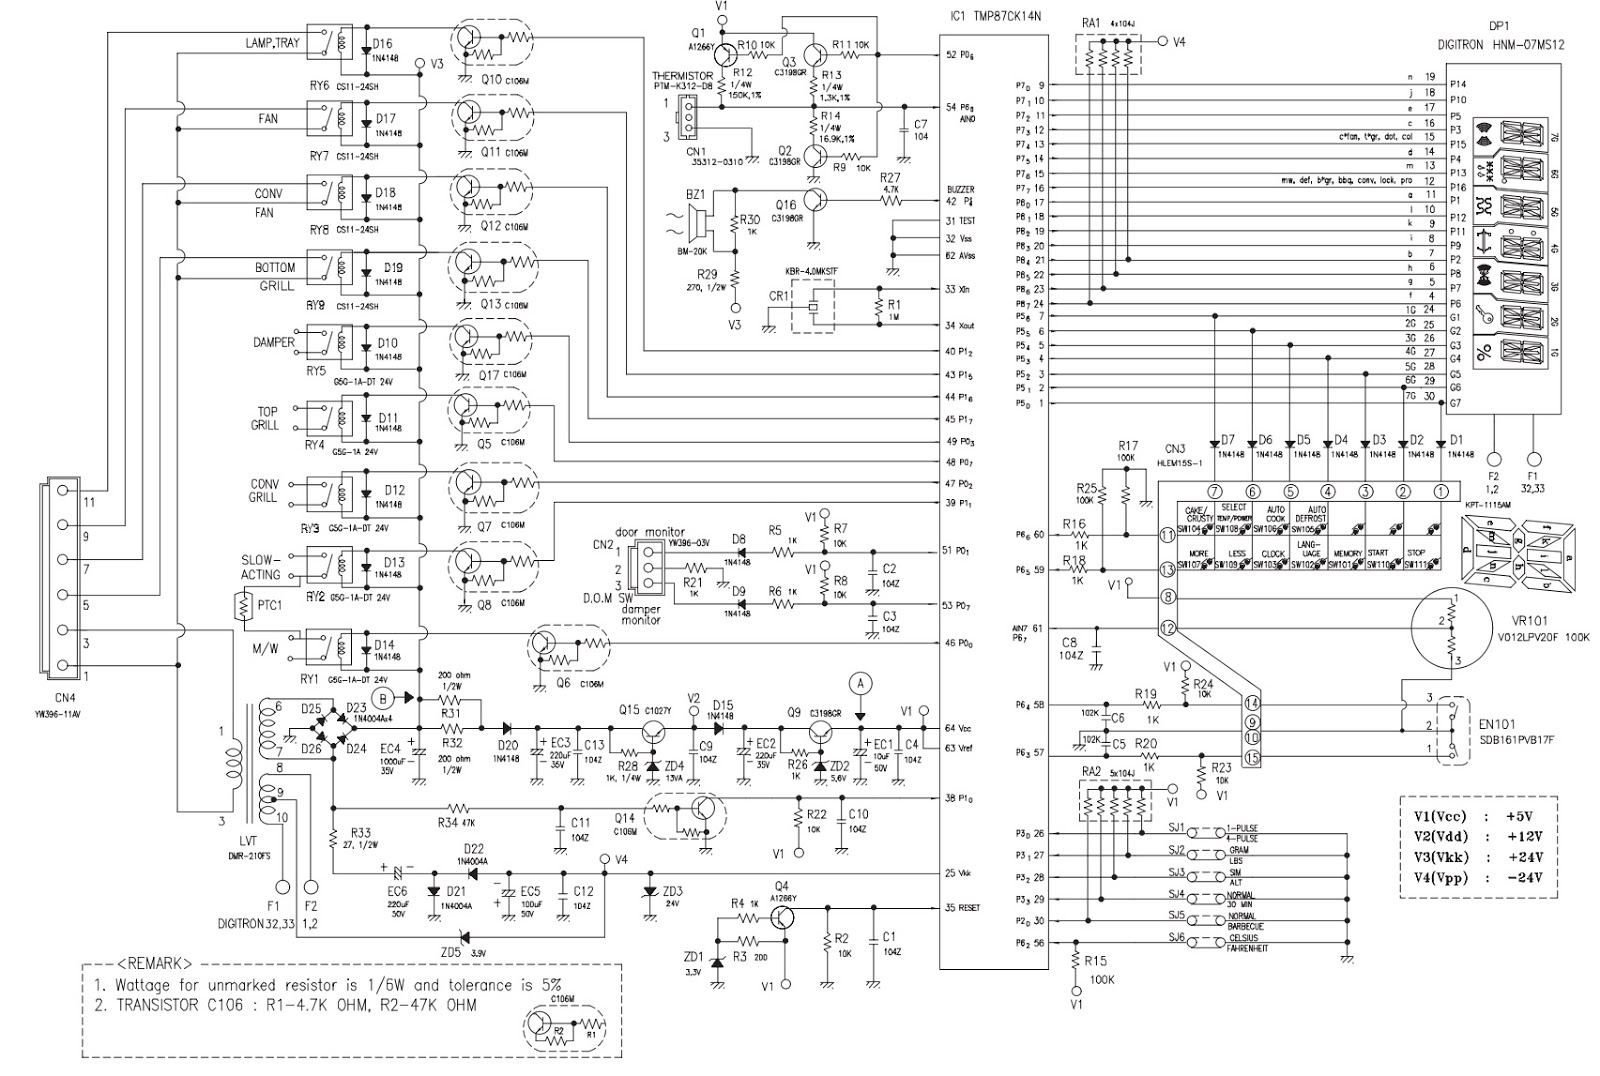 small resolution of maytag microwave wiring diagram basic electronics wiring diagram maytag oven wiring diagram wrg 1374 maytag